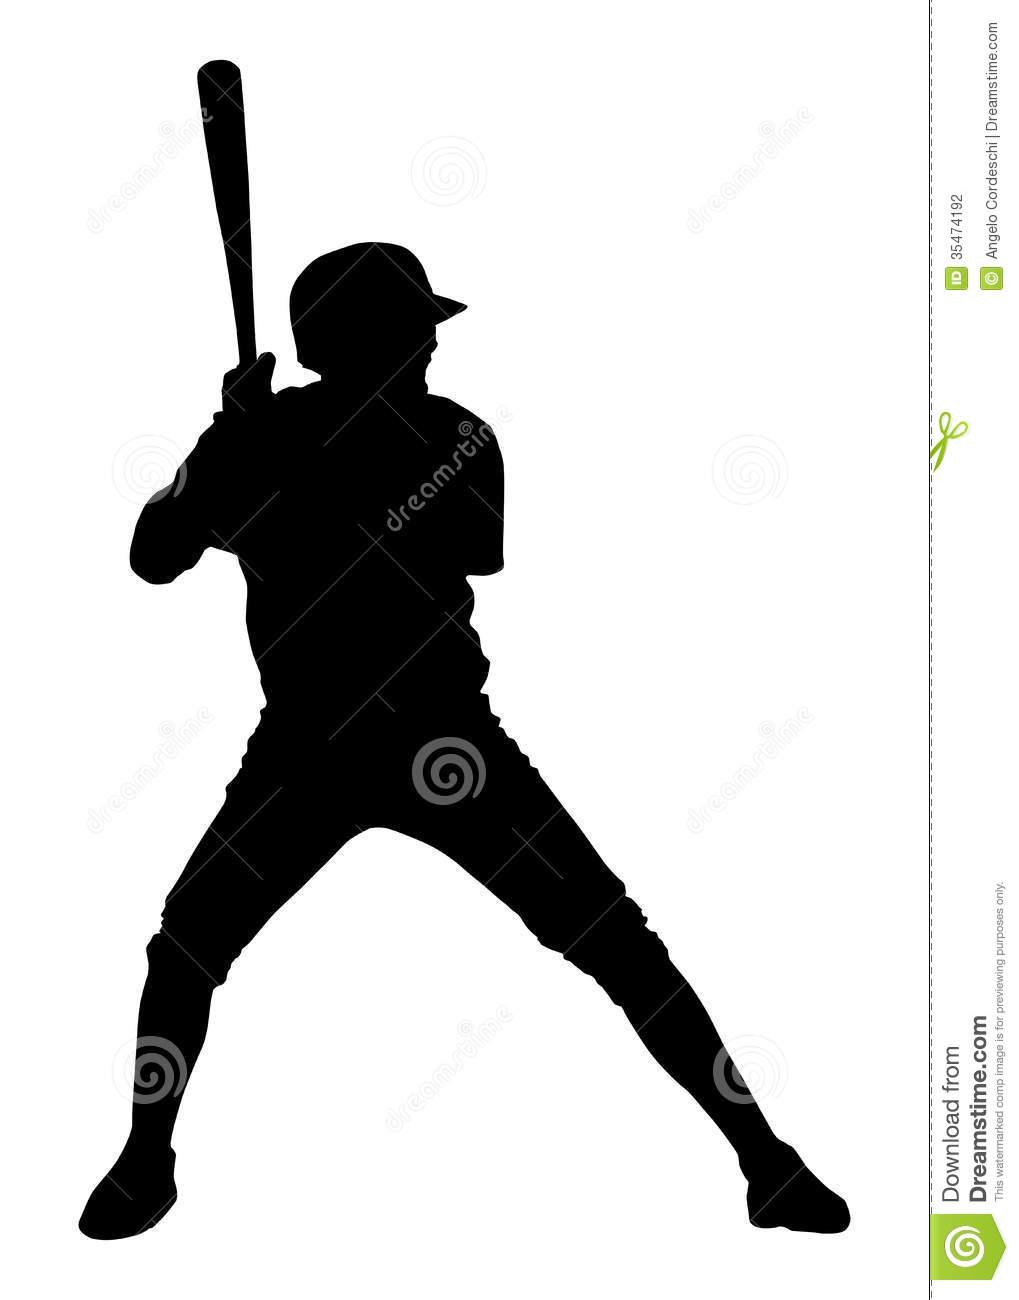 Baseball Player Clipart Black And White | Clipart Panda - Free ...